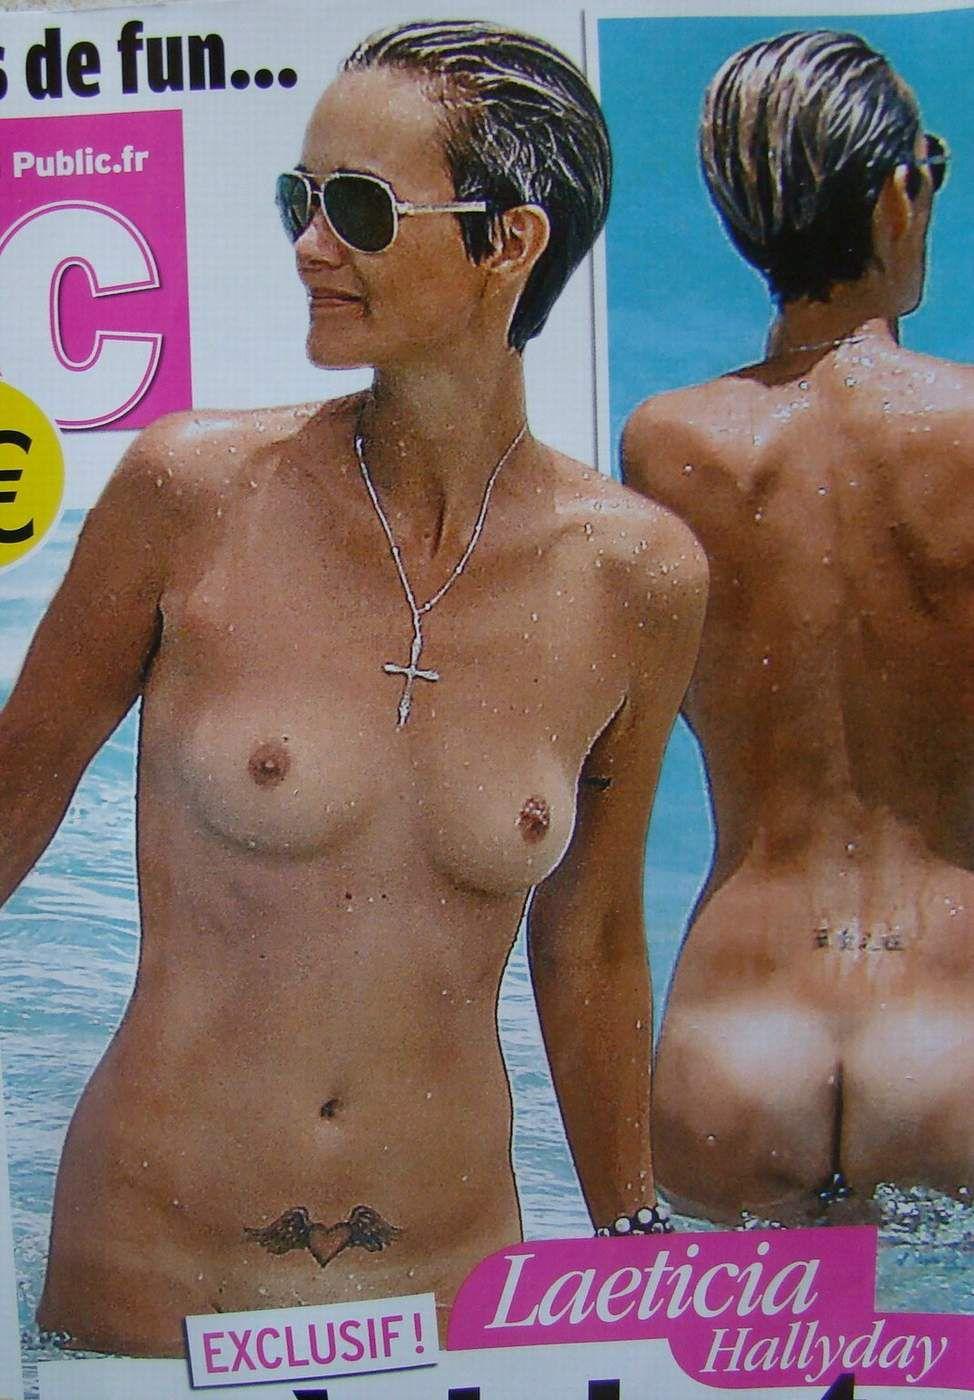 Laure manaudou nude stolen pictures